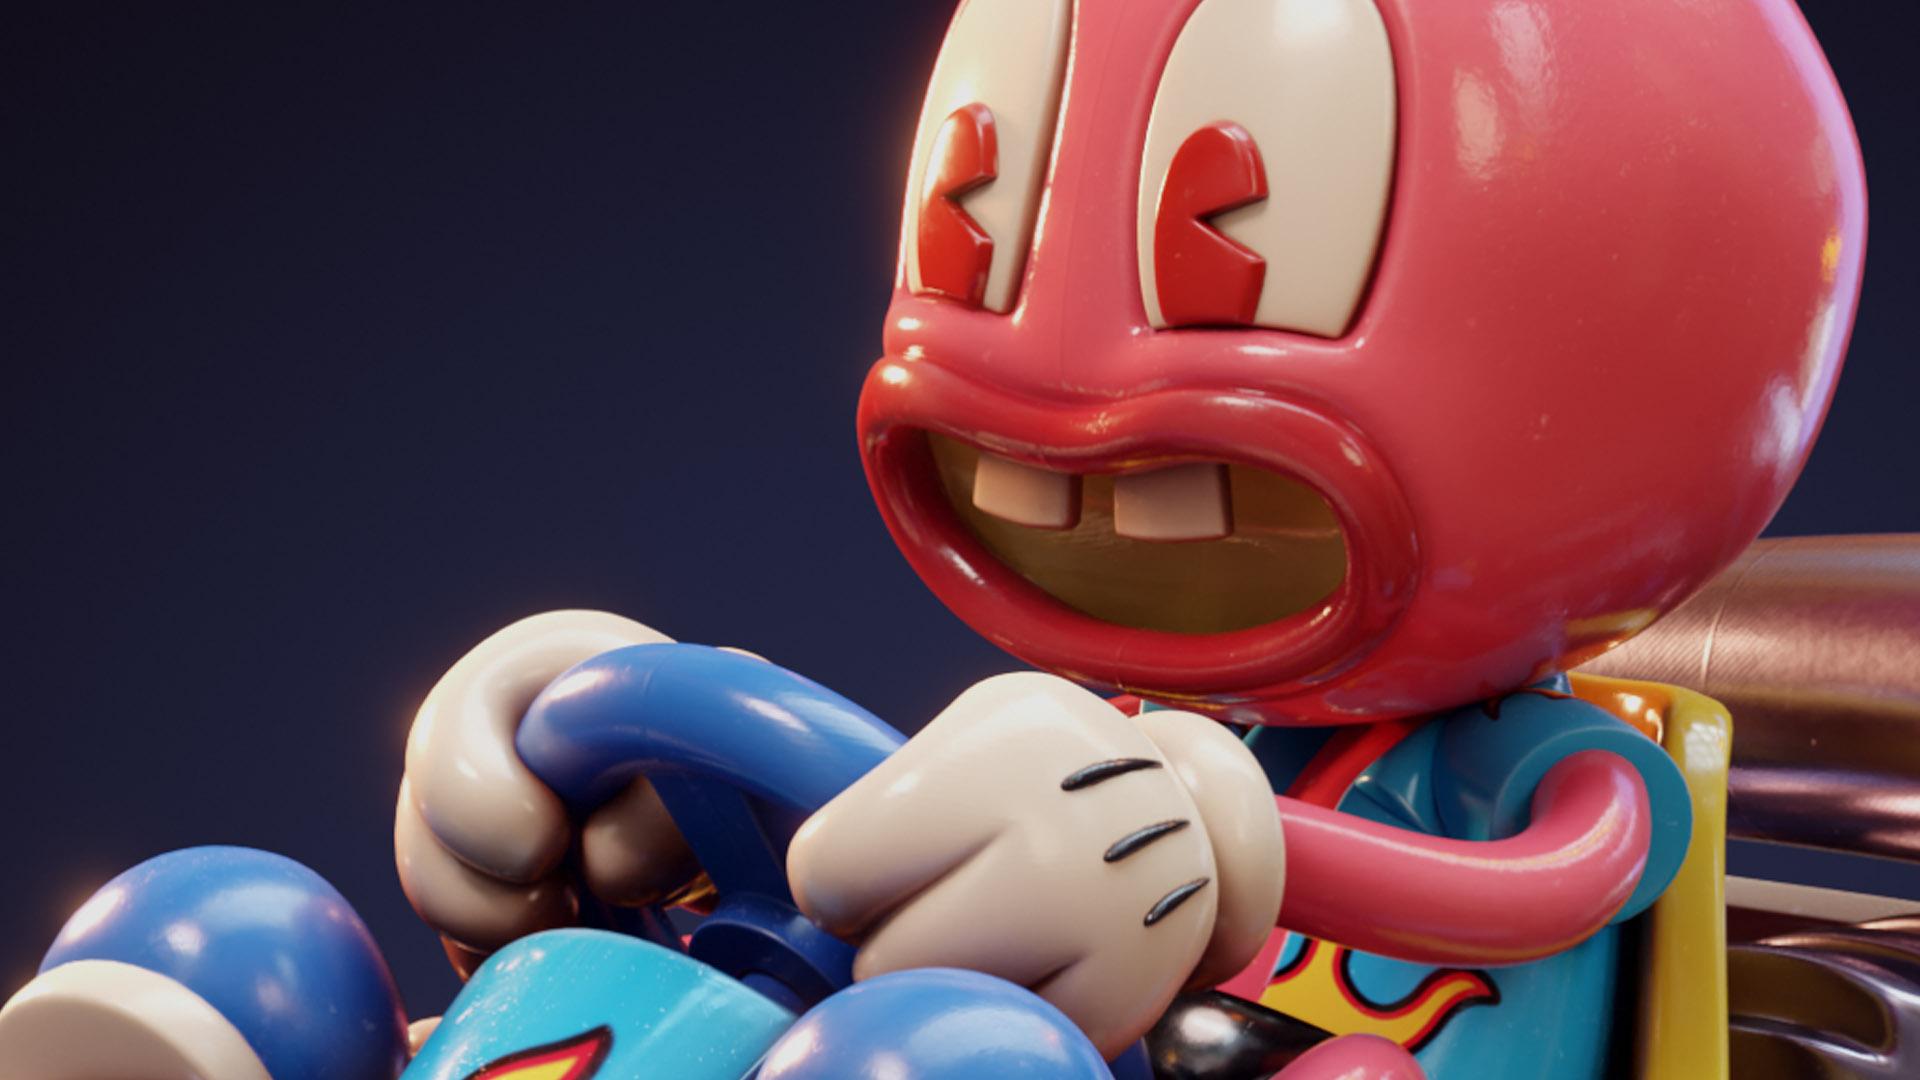 cherrybomb detail enlargement 1